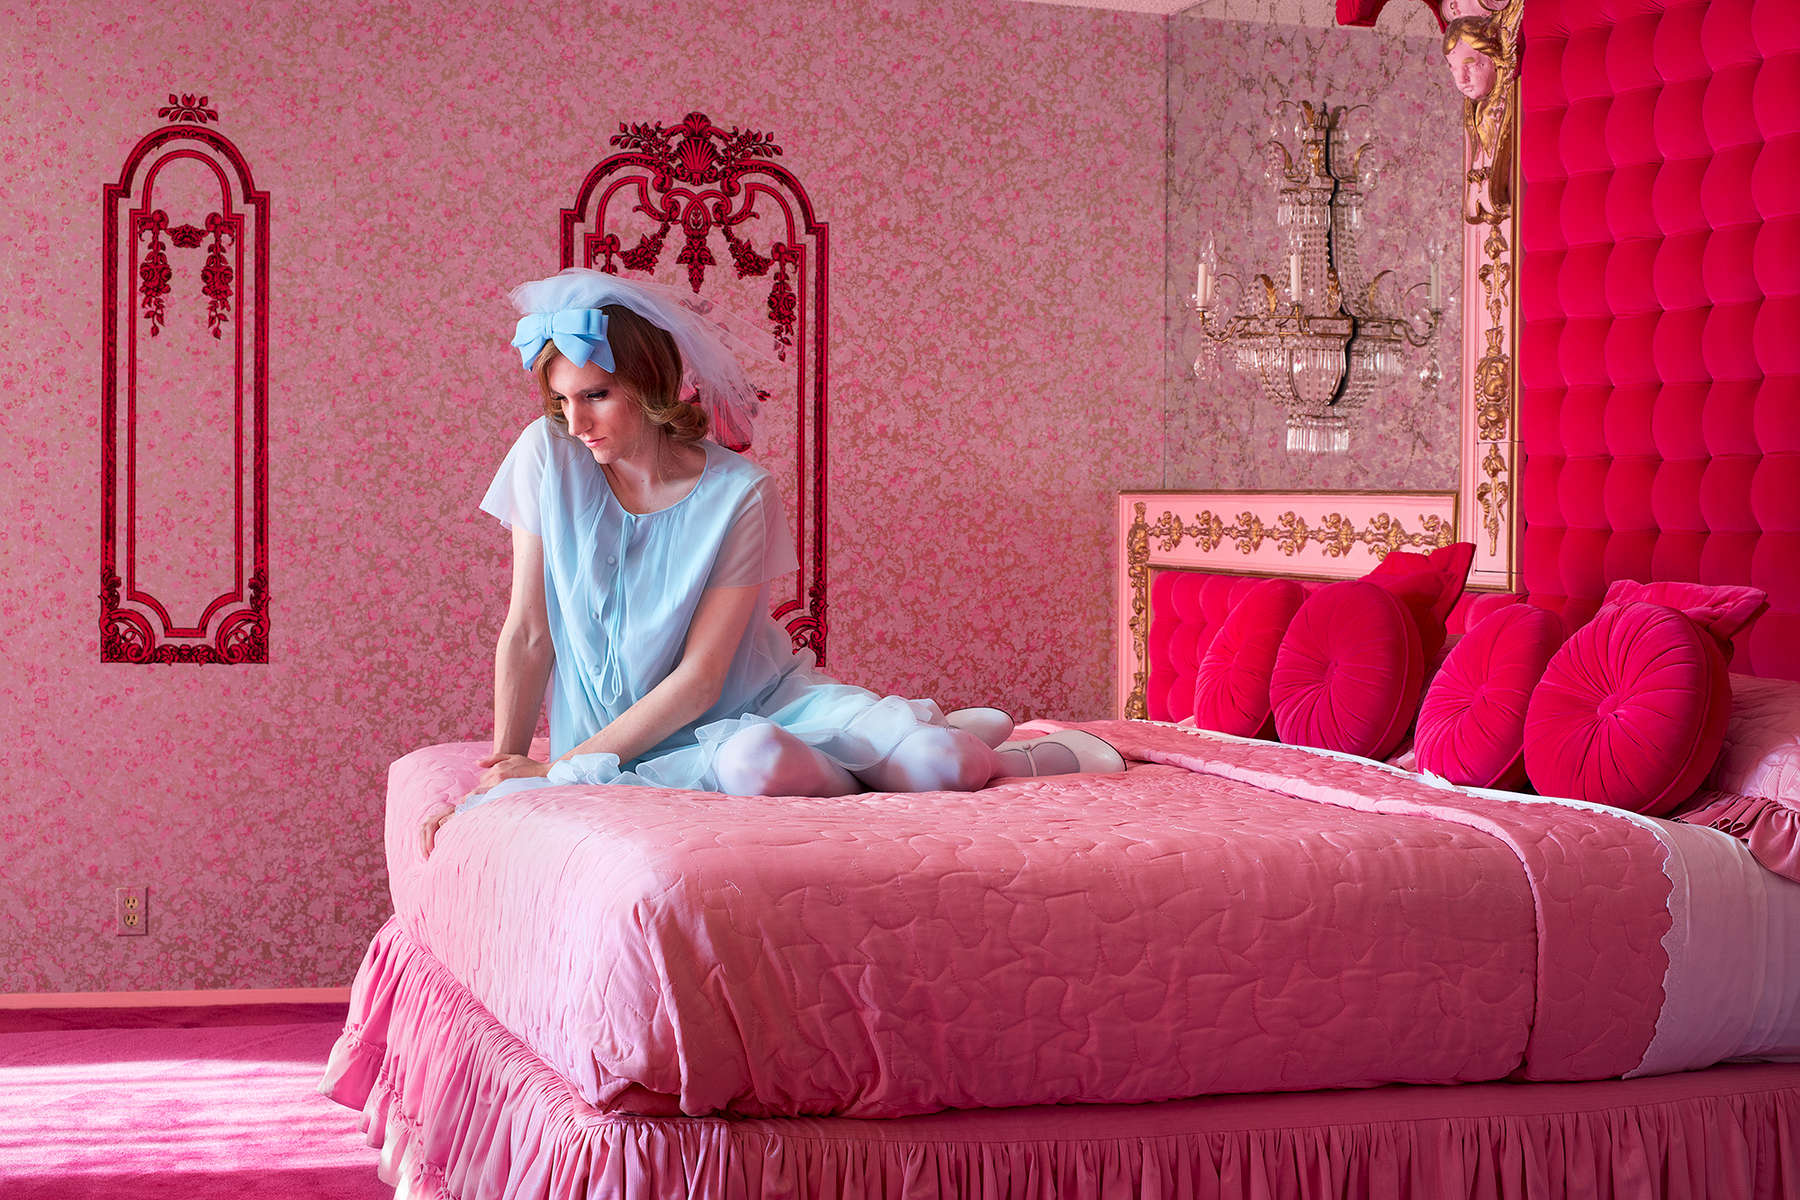 Pink Bedroom (for Priscilla) , 2017, archival pigment print; ©Lissa Rivera/courtesy of ClampArt, New York City